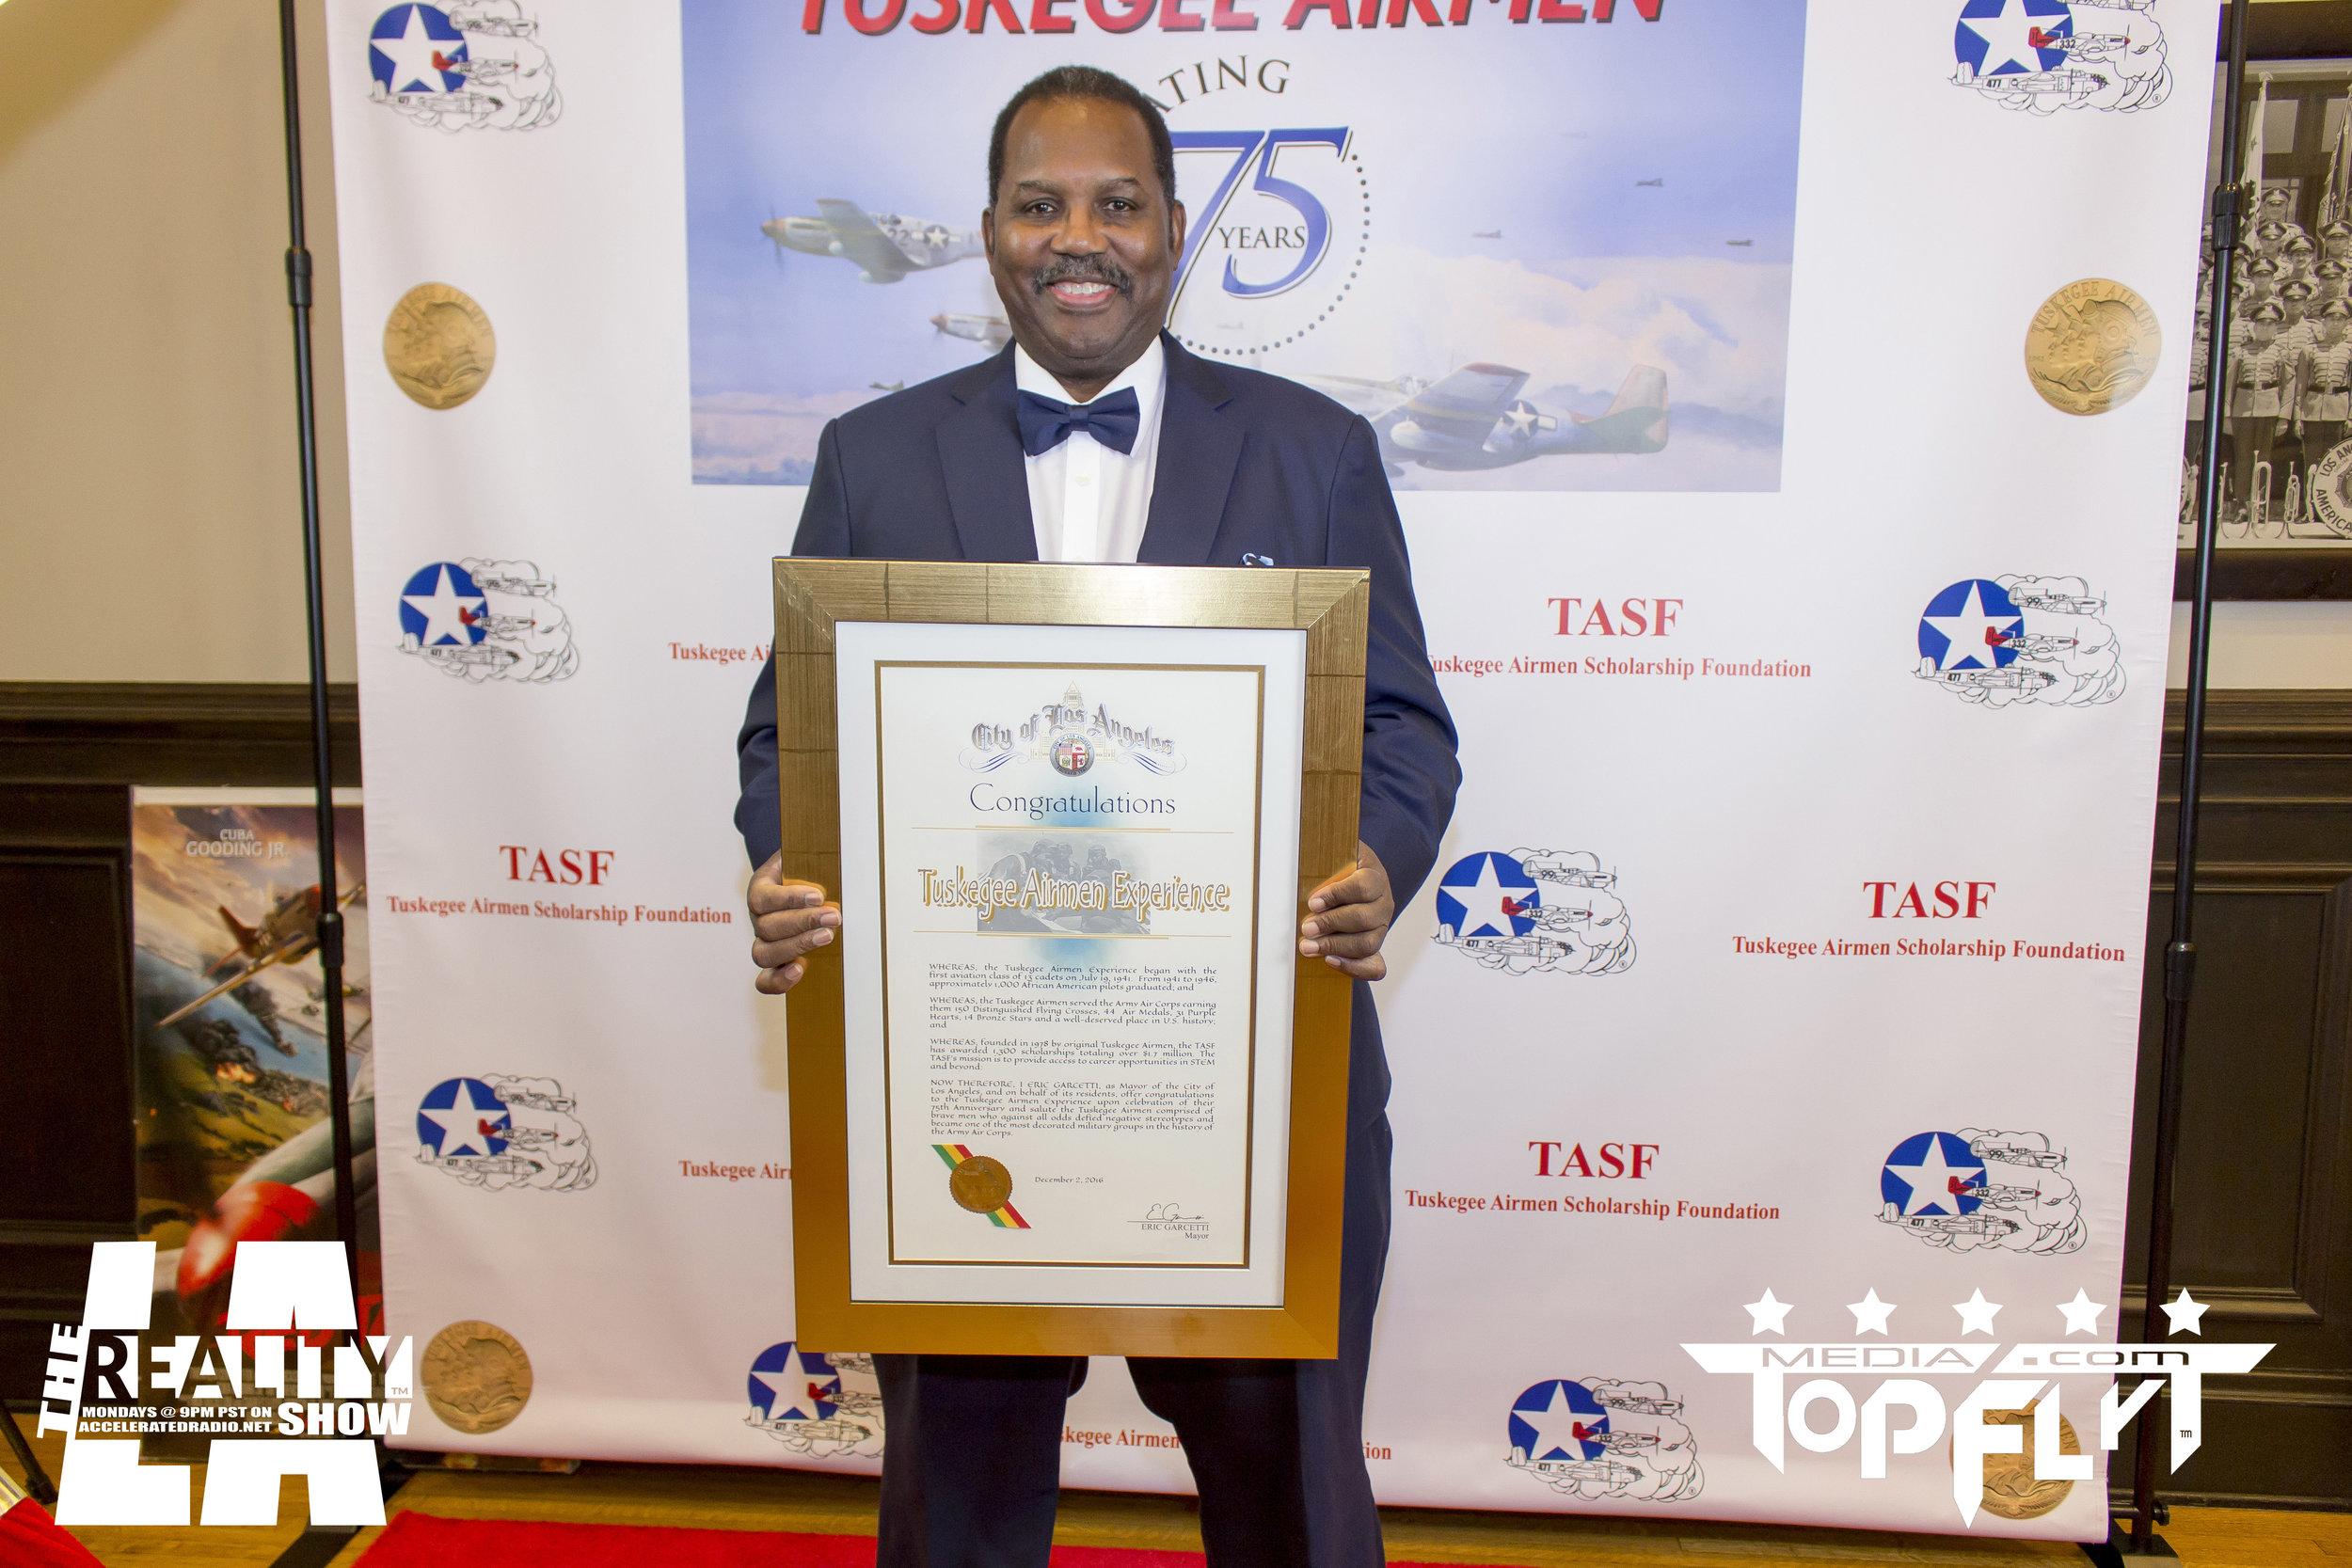 The Reality Show LA - Tuskegee Airmen 75th Anniversary VIP Reception_110.jpg